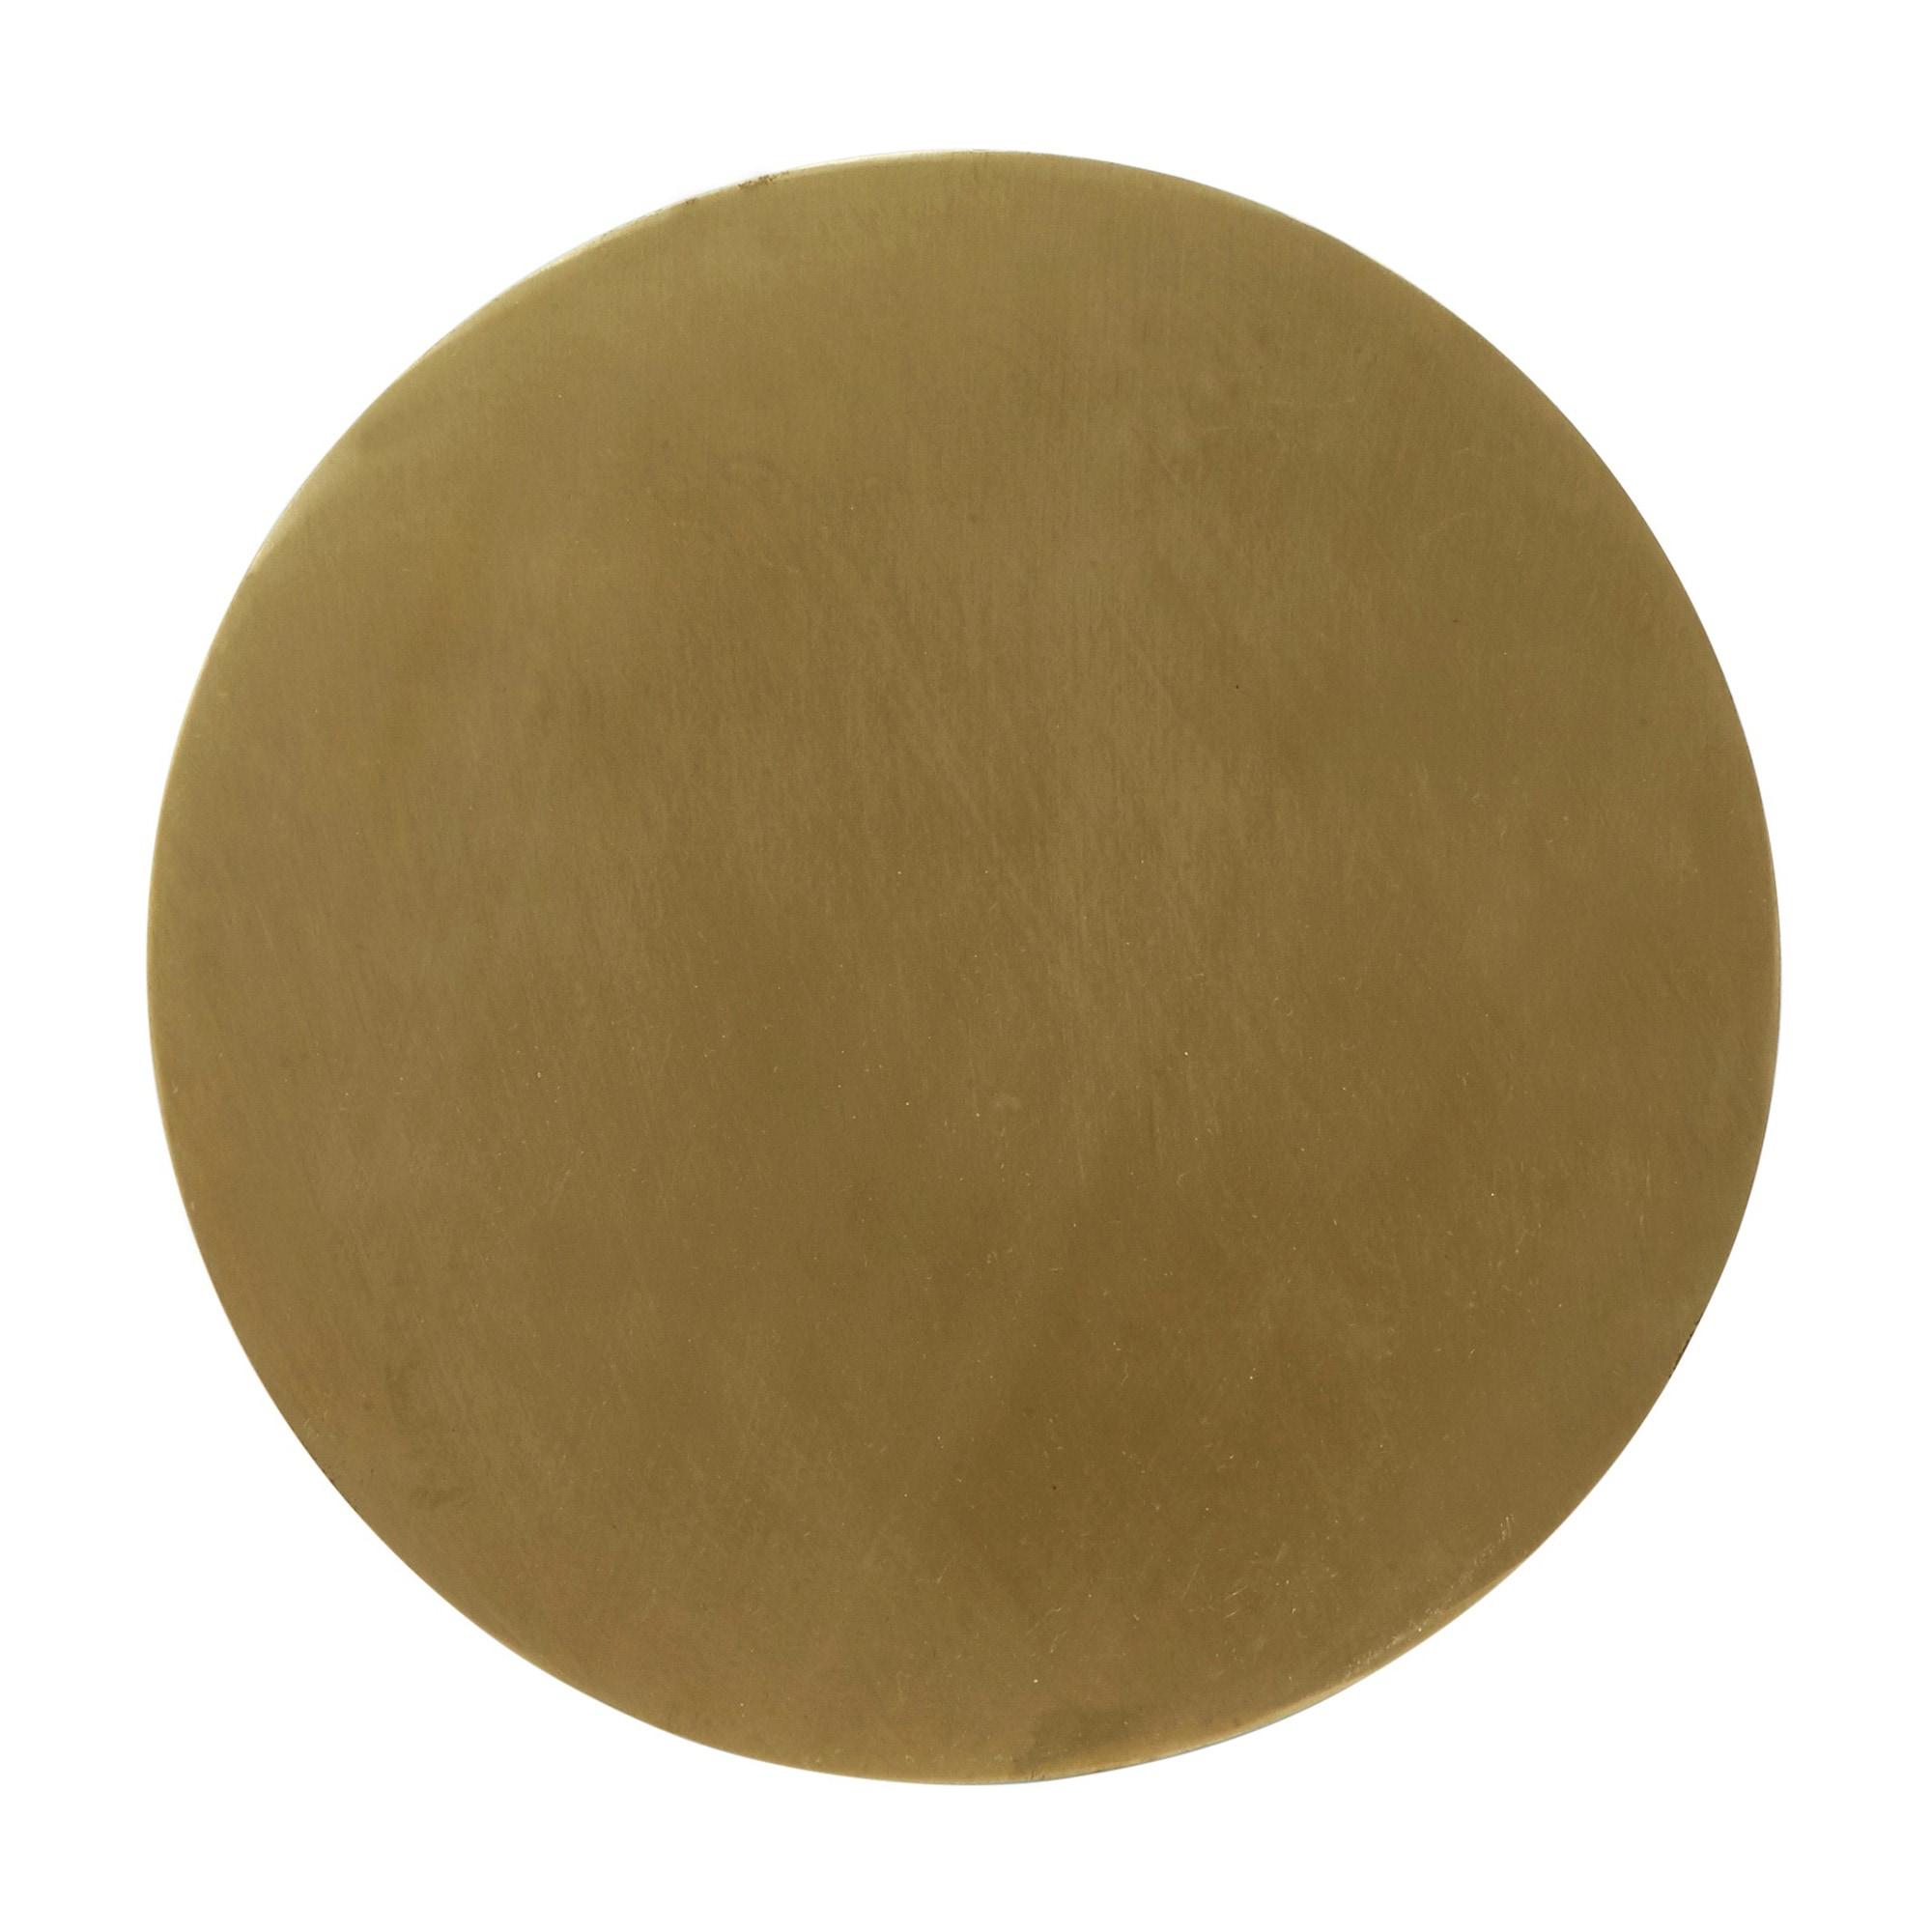 Fullmoon Ø25 vägglampa pale gold